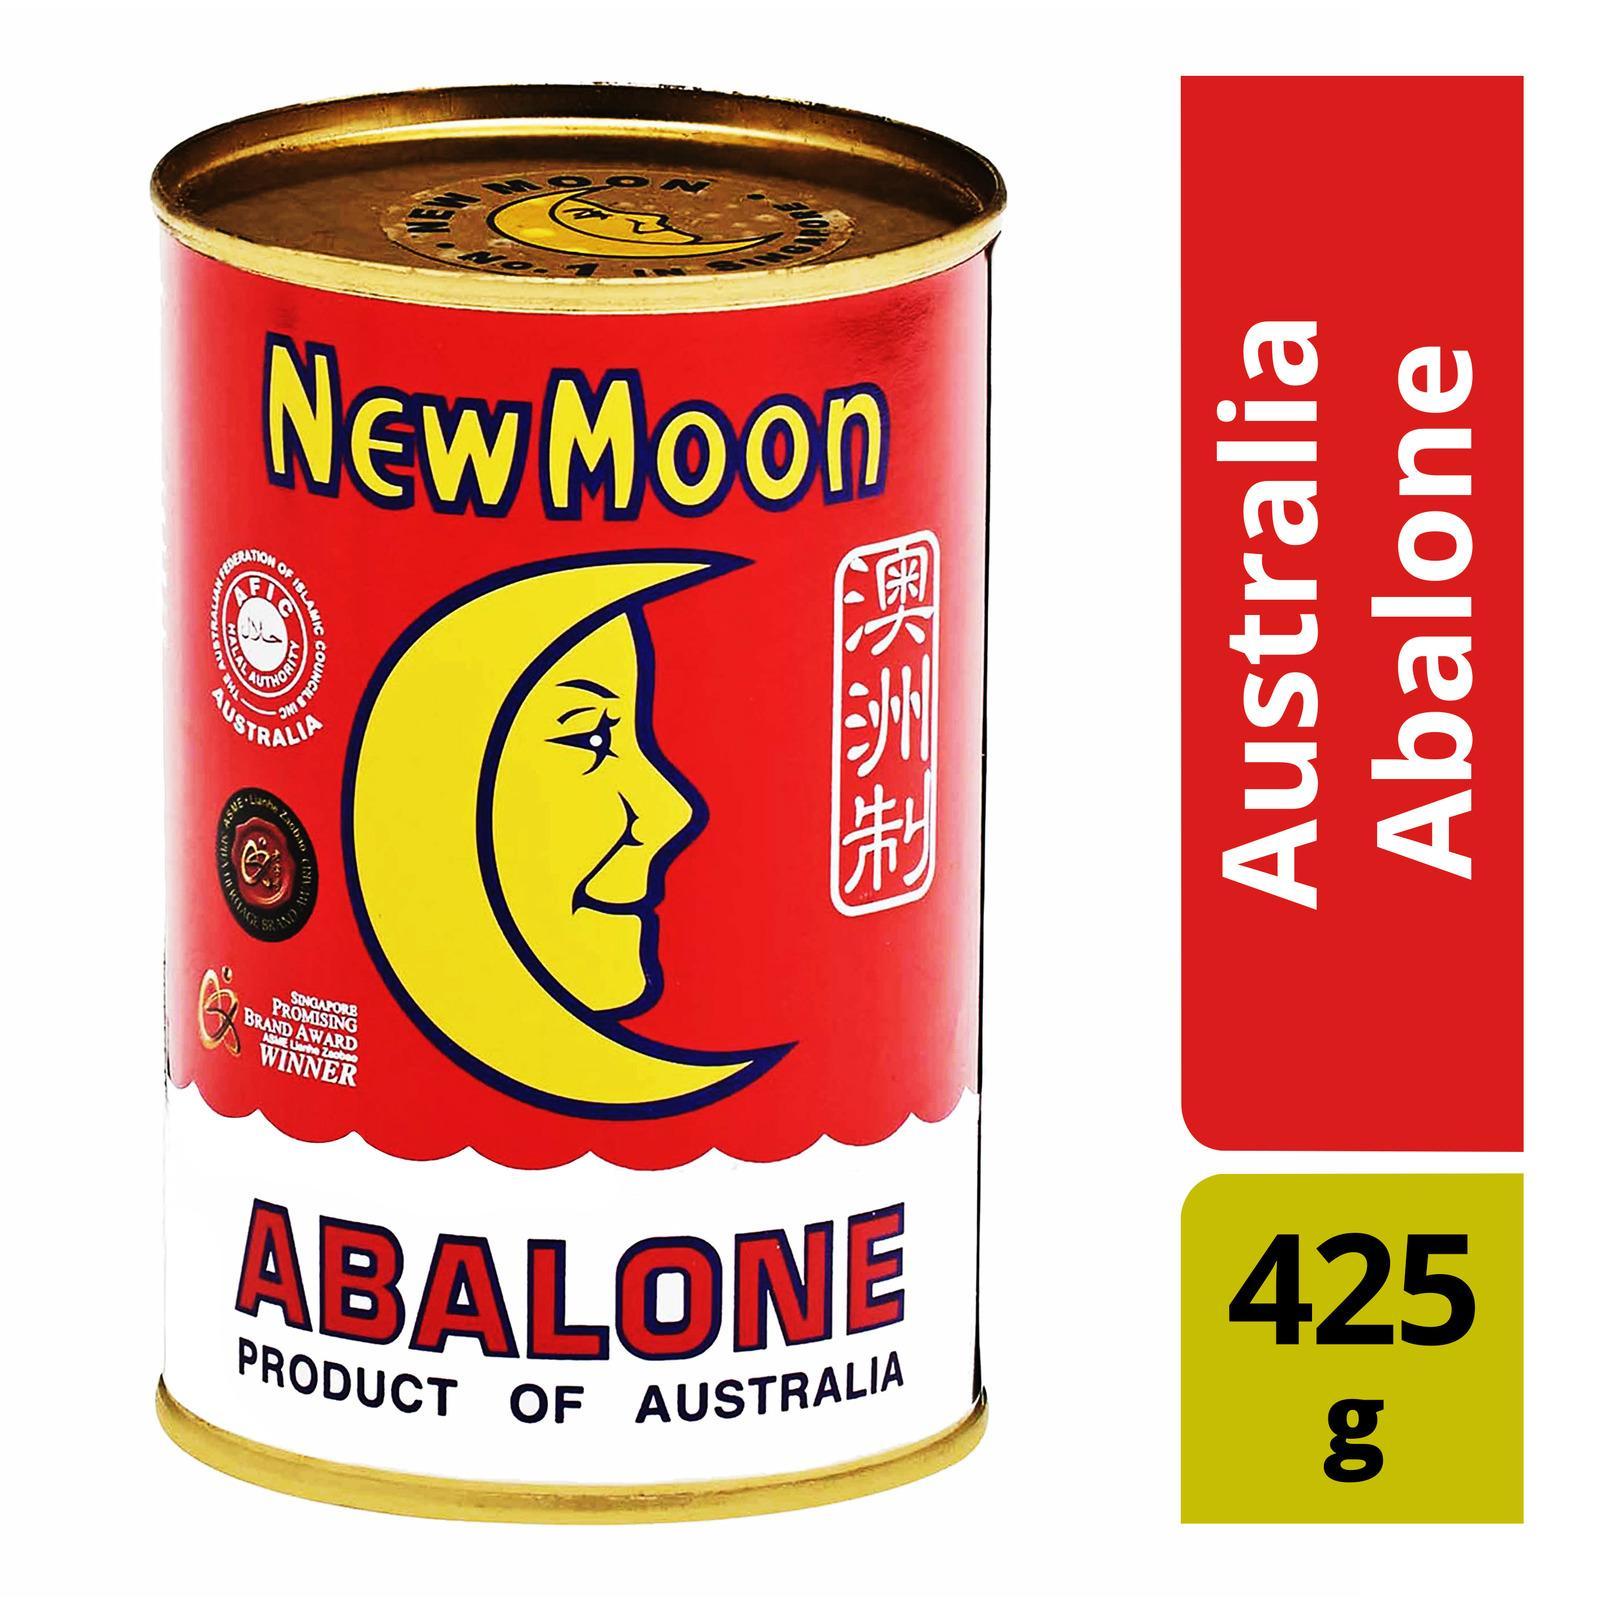 New Moon Australia Abalone 425g - 3 Pcs By Best Buy Mini Mart.